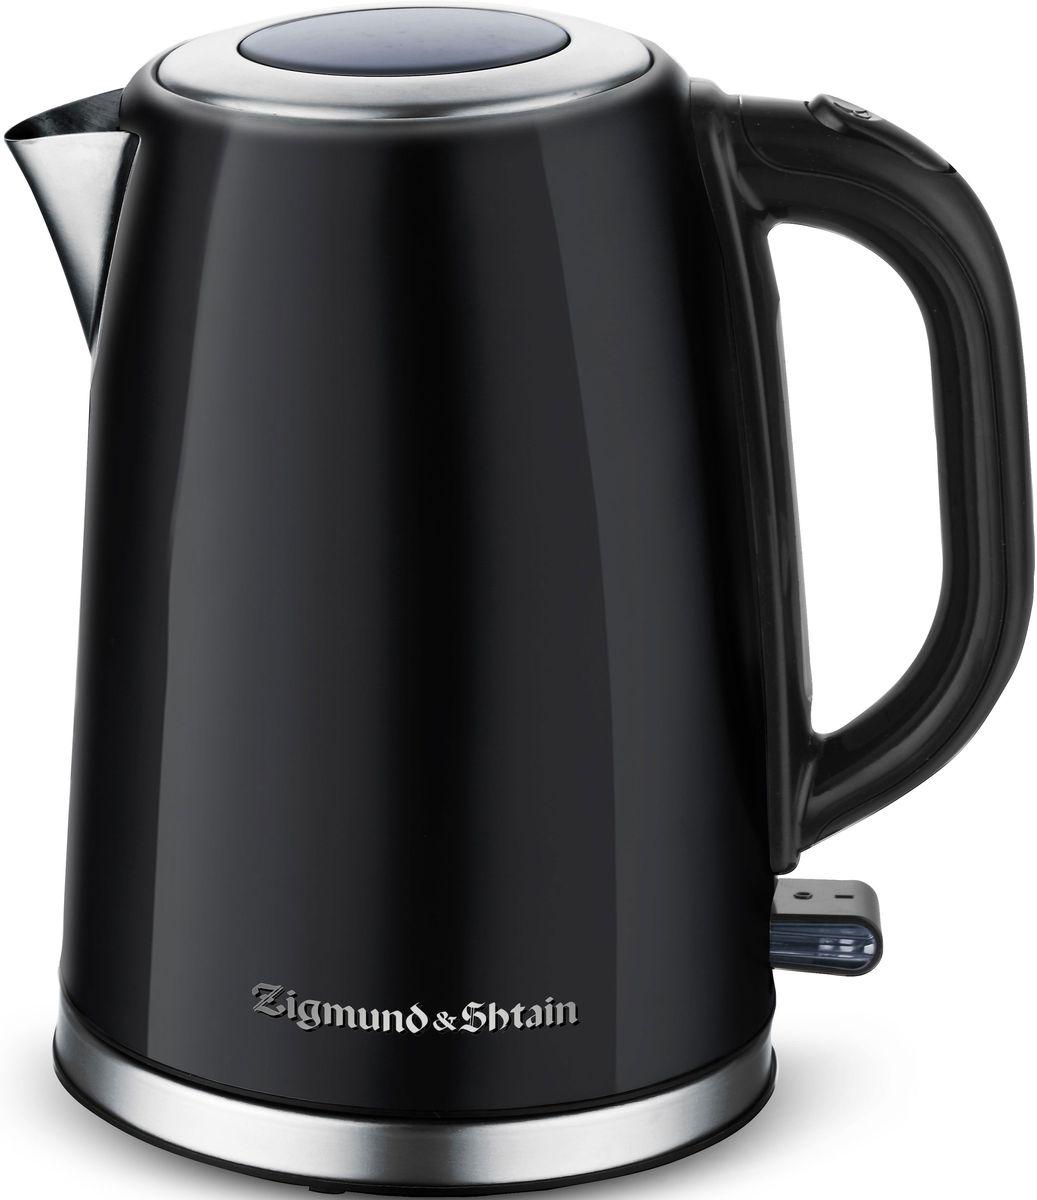 Zigmund & Shtain KE-718 электрический чайник чайник электрический ke 317psw